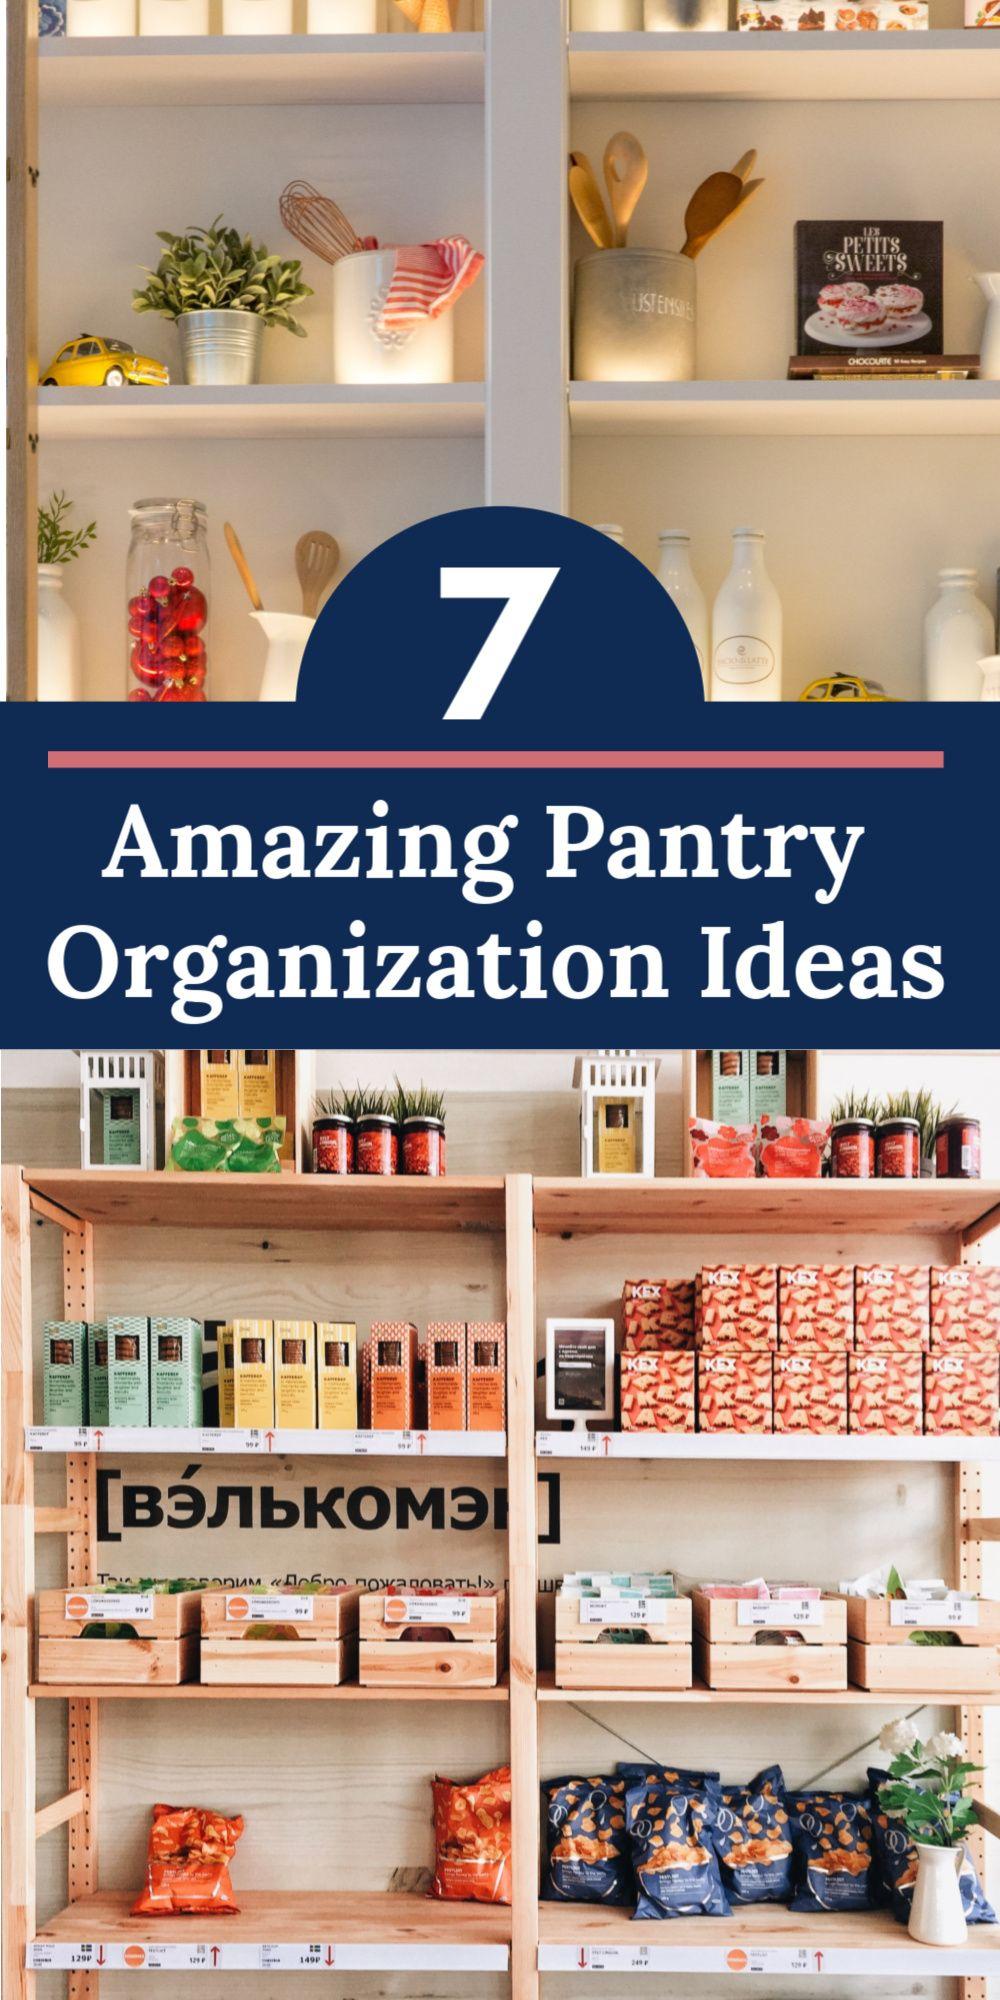 7 Awesome Pantry Organization Ideas to Keep You Tidy #pantryorganizationideas